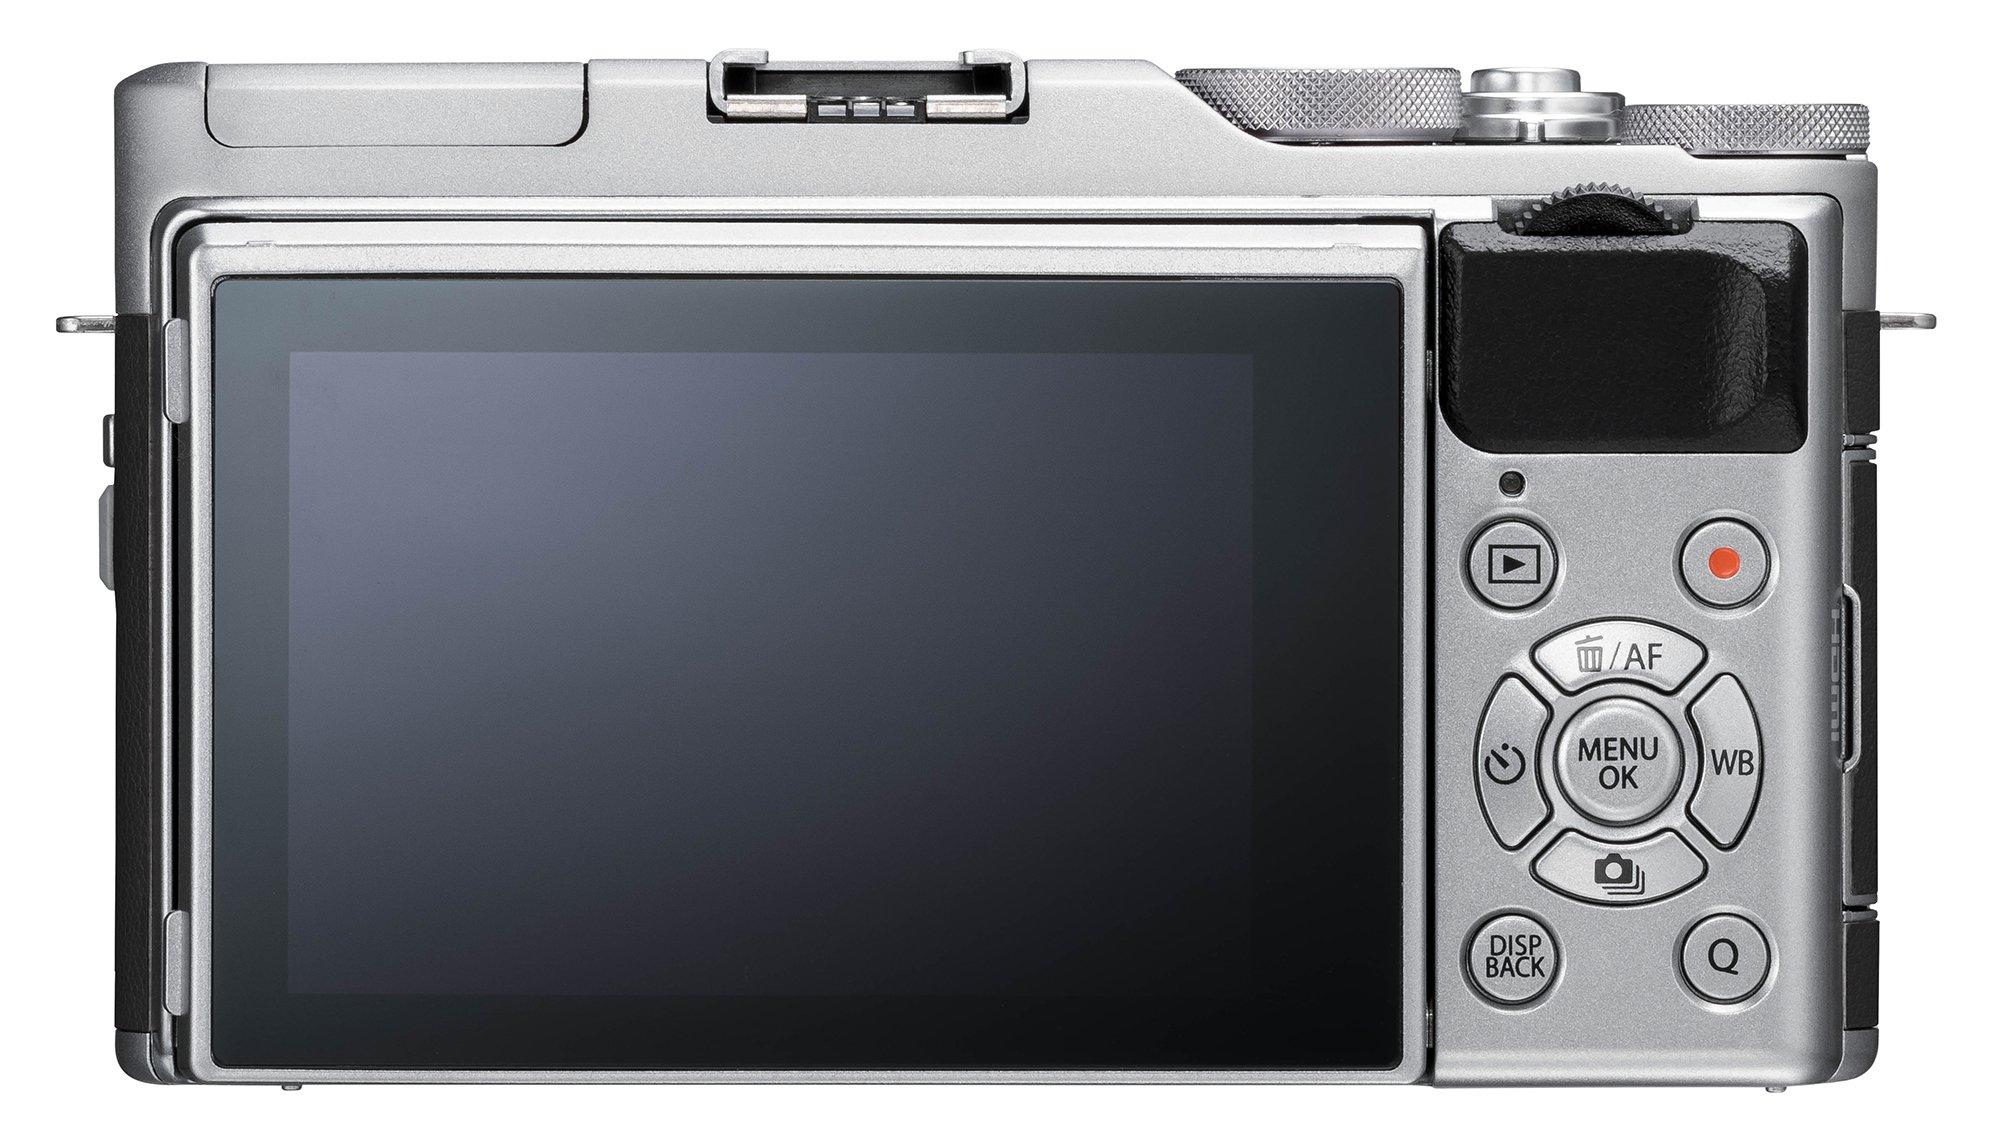 Fujifilm X-A5 Mirrorless Digital Camera w/XC15-45mmF3.5-5.6 OIS PZ Lens - Silver by Fujifilm (Image #3)